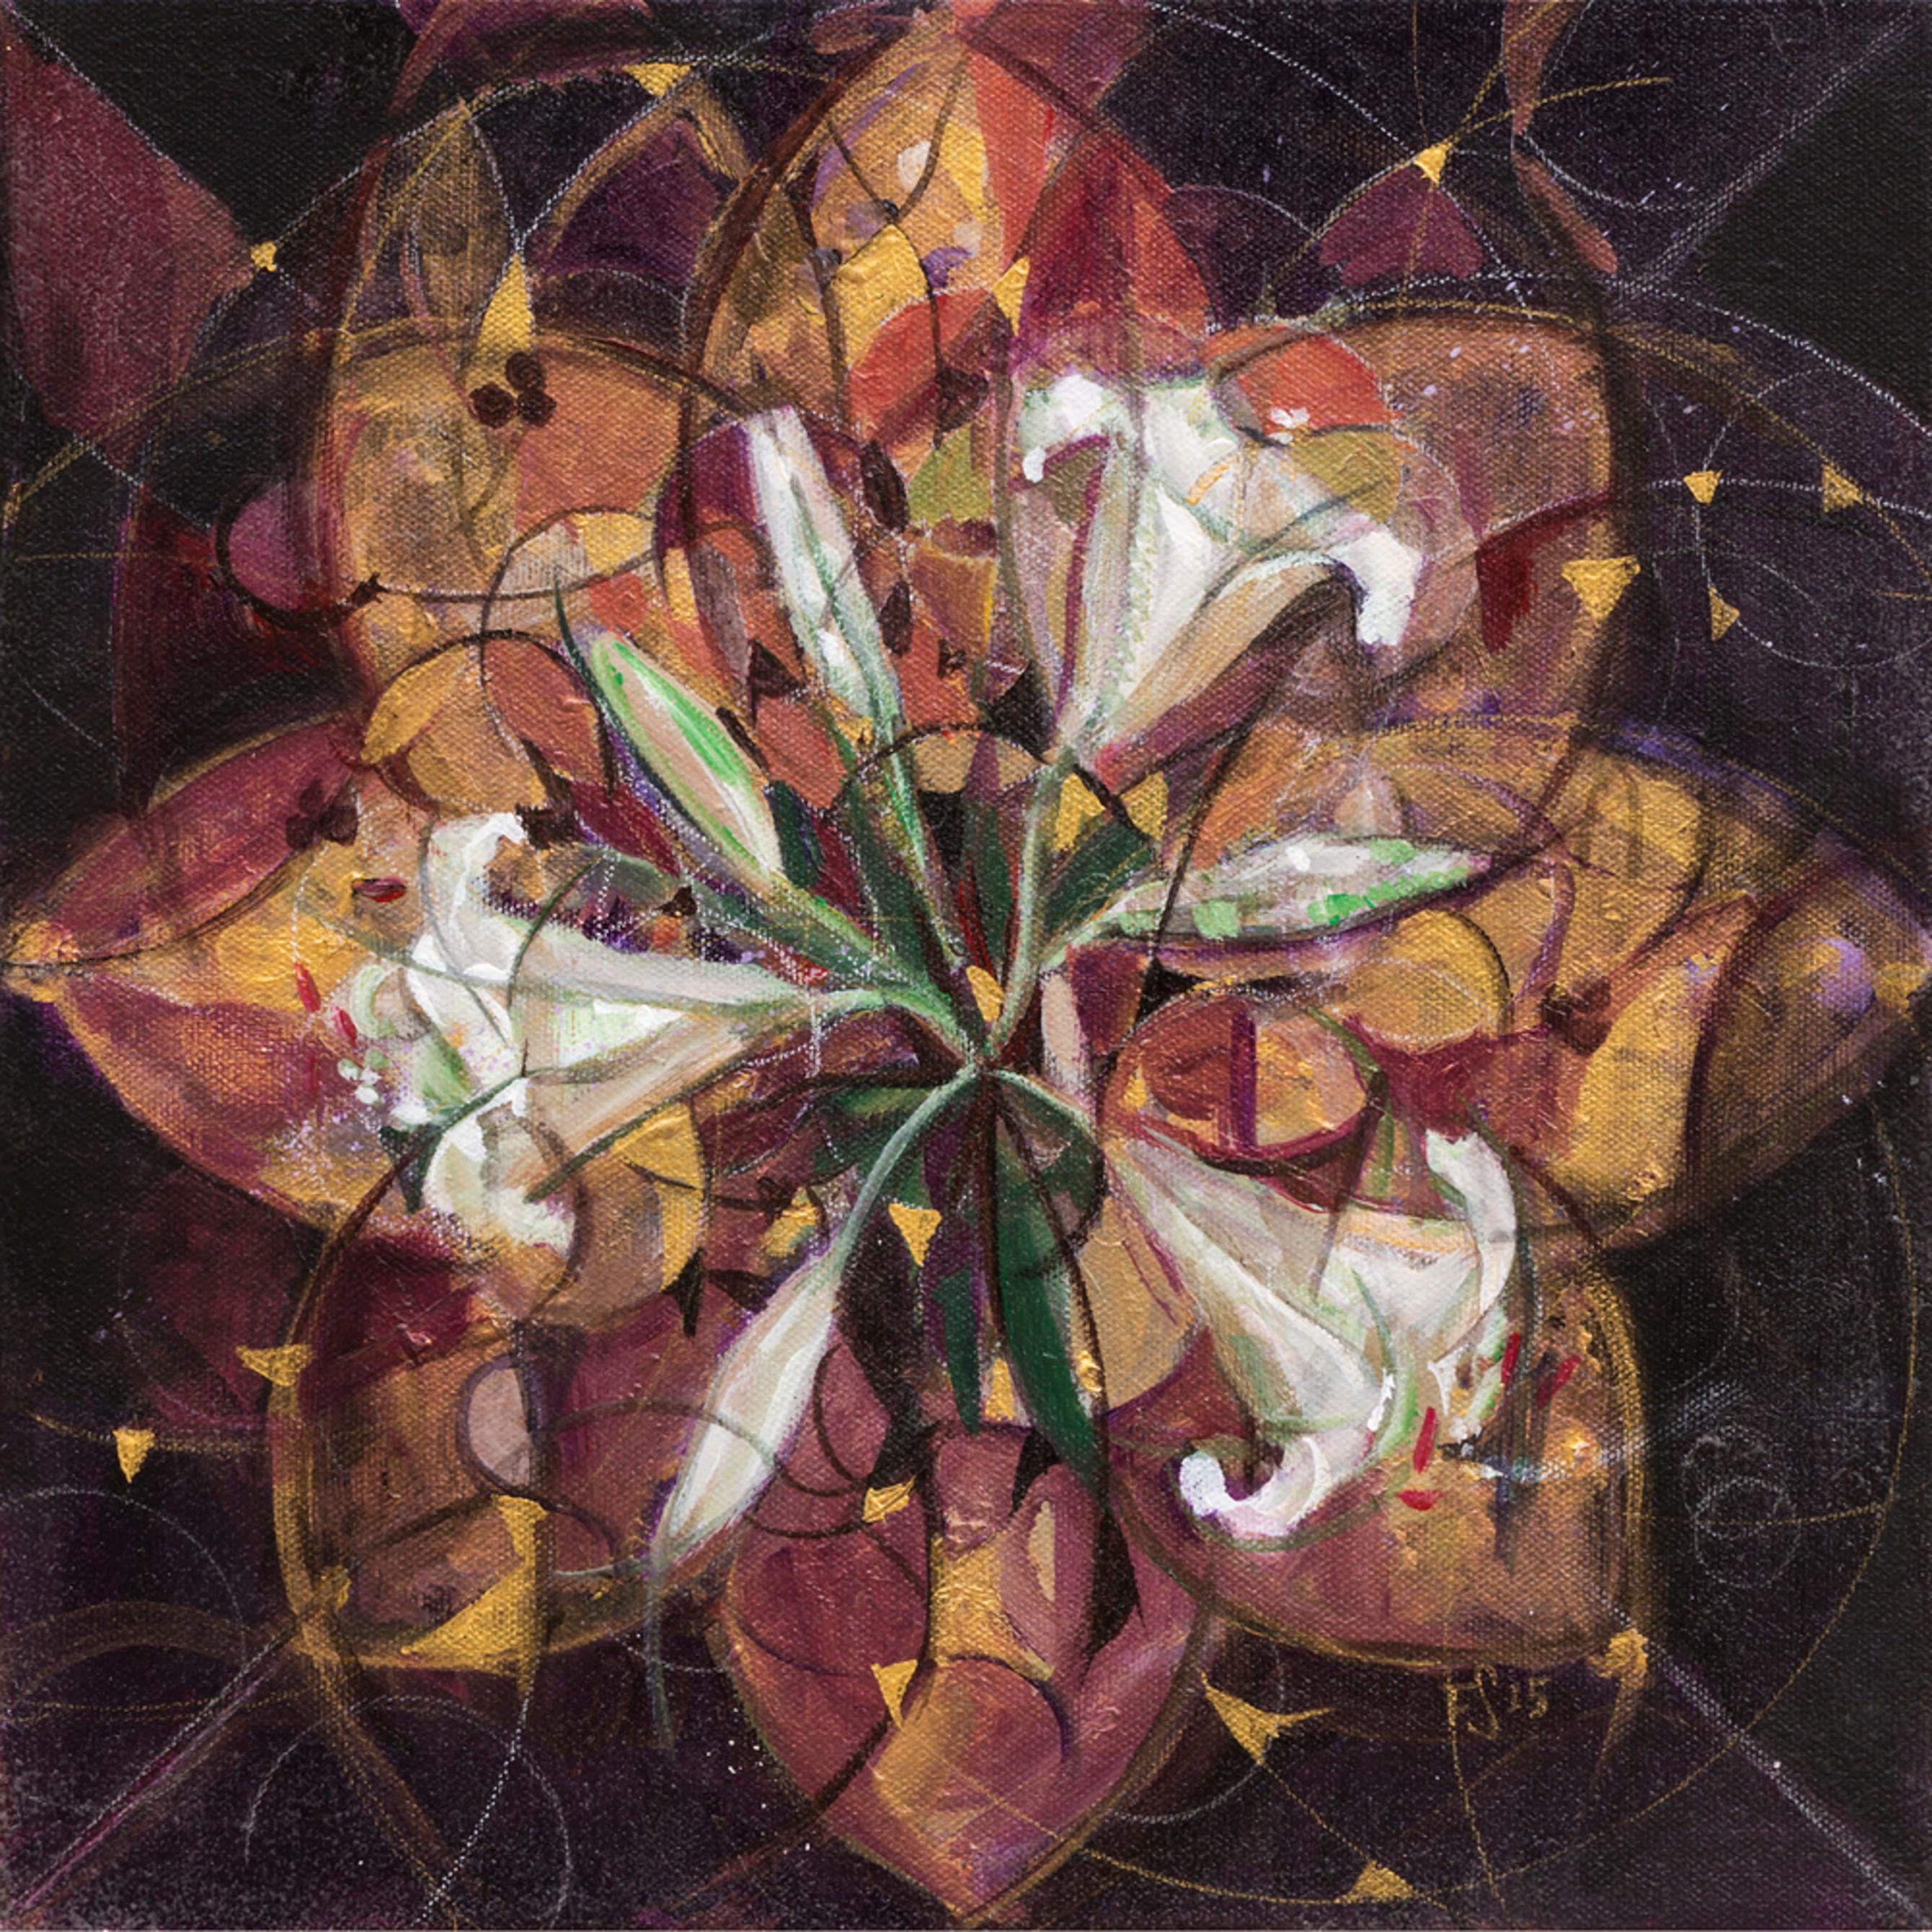 Ecstasy of the lilies wwz0cq